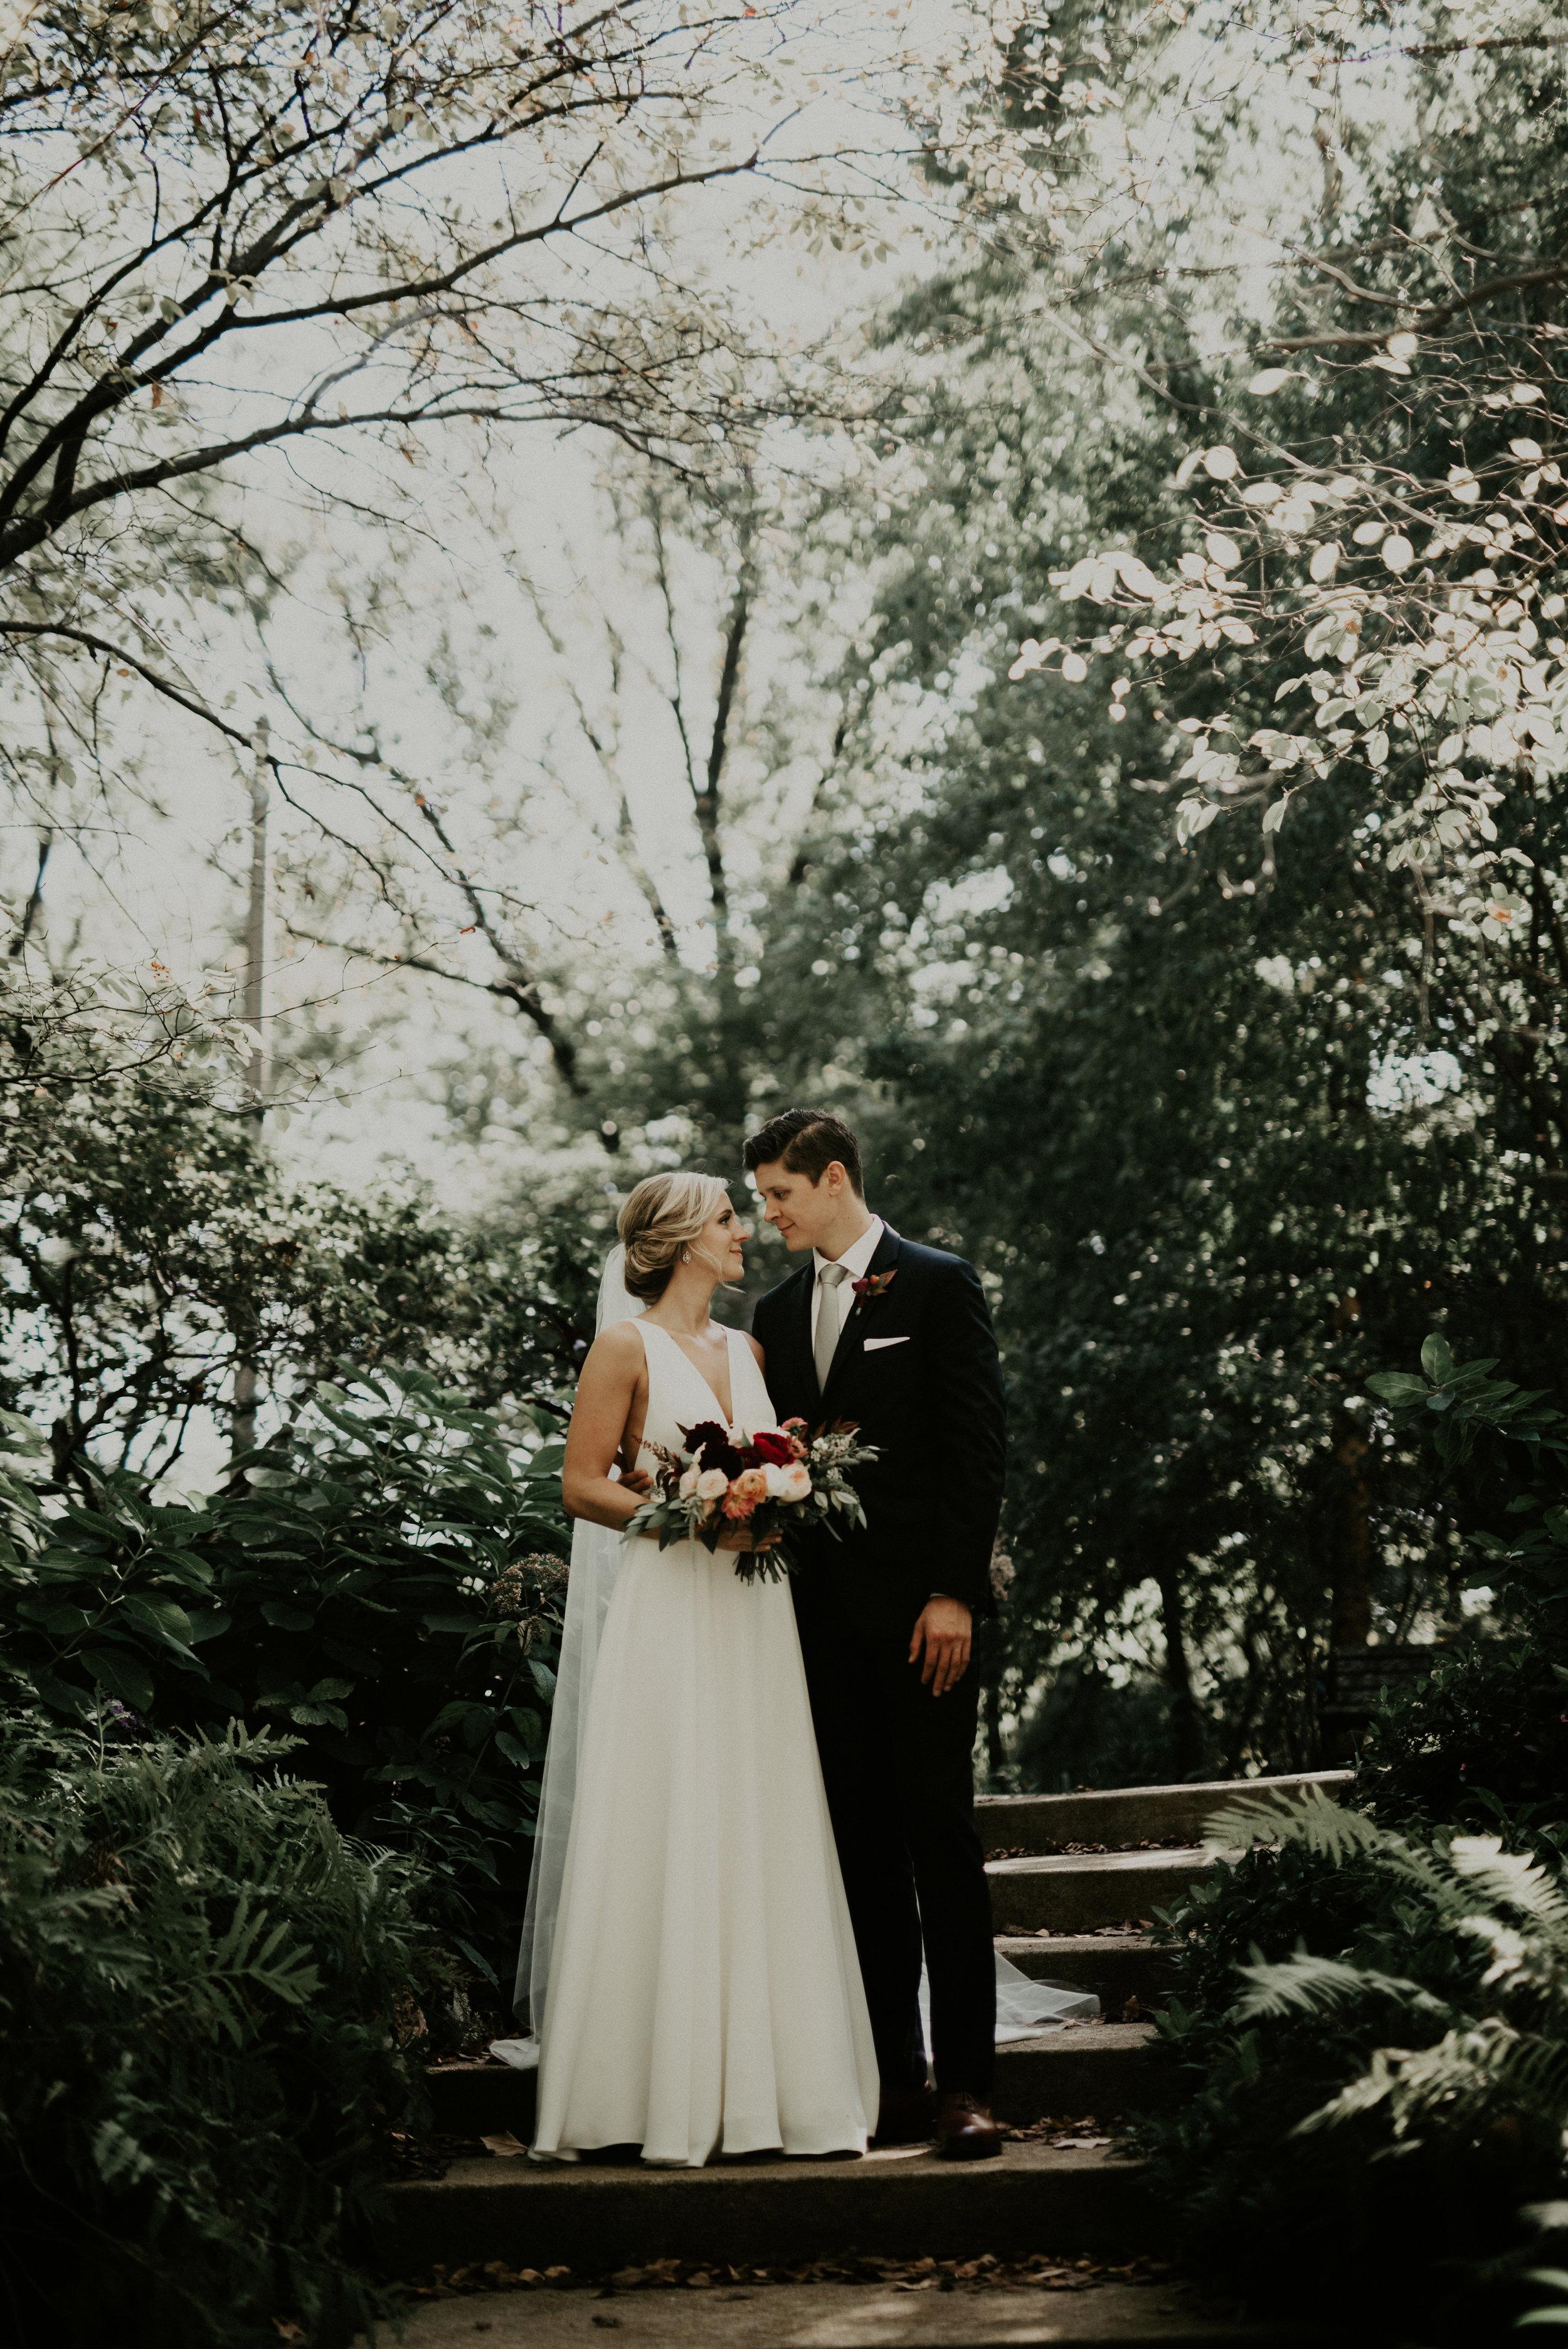 Annie_Sam_Married-336.jpg